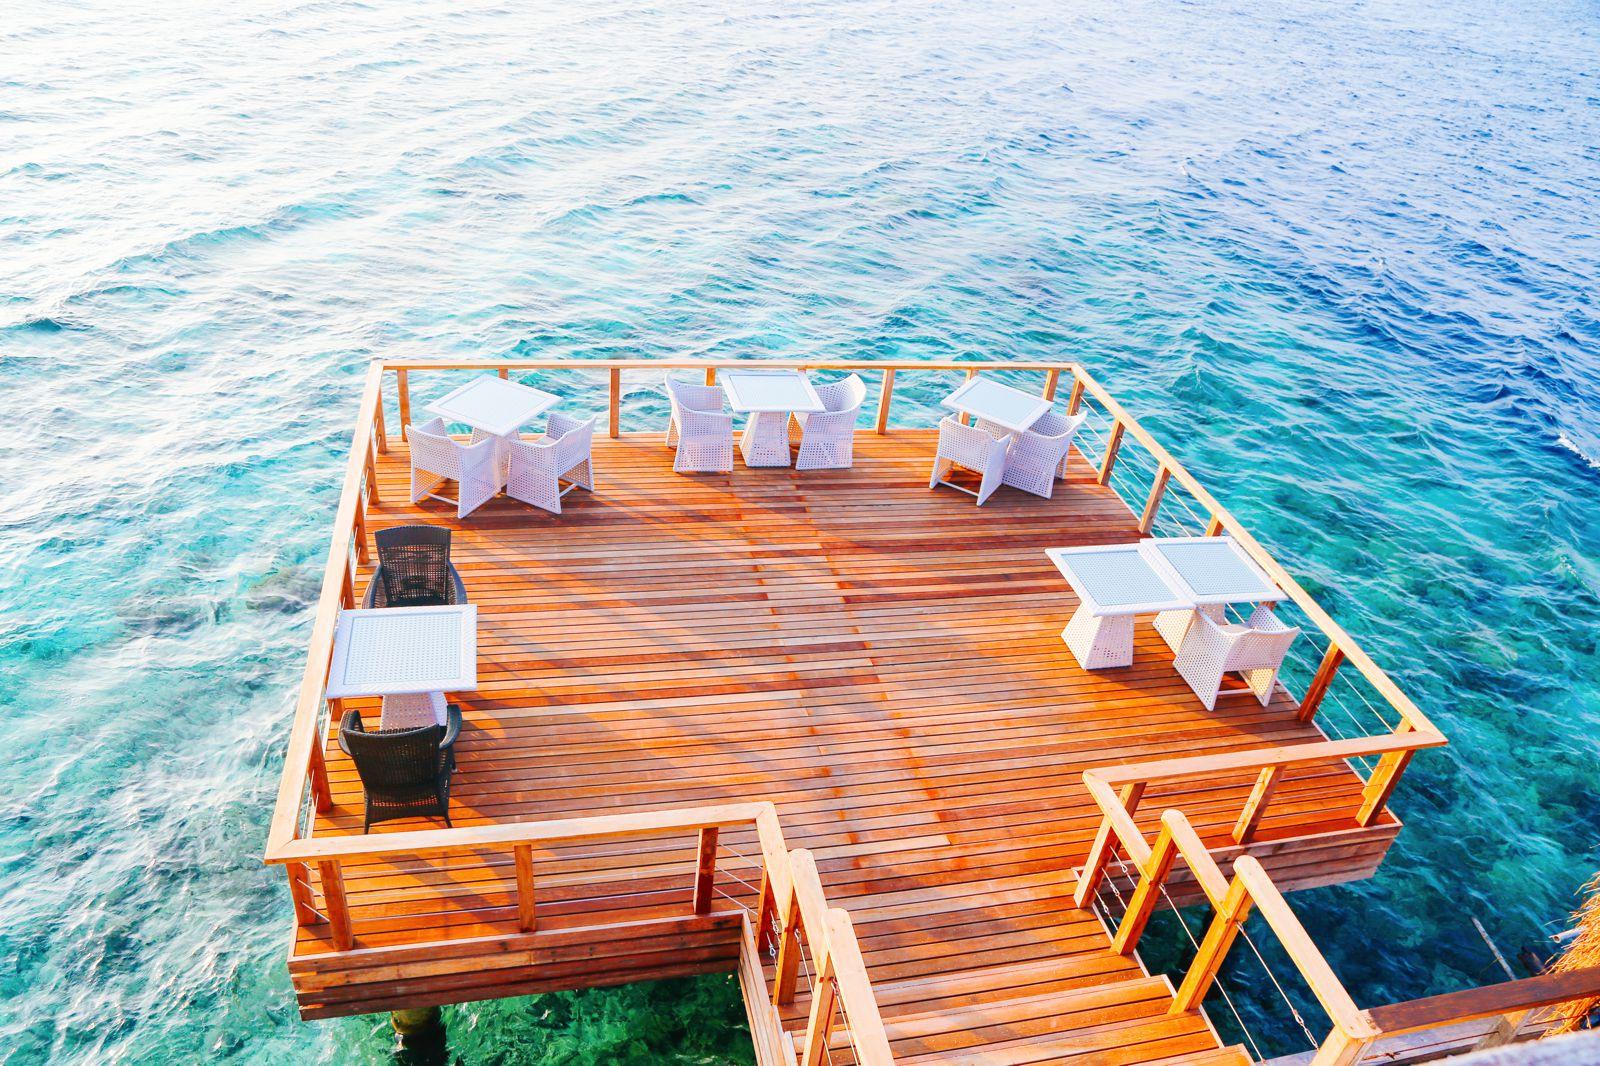 tropical island life in the maldives 59 - Island Life